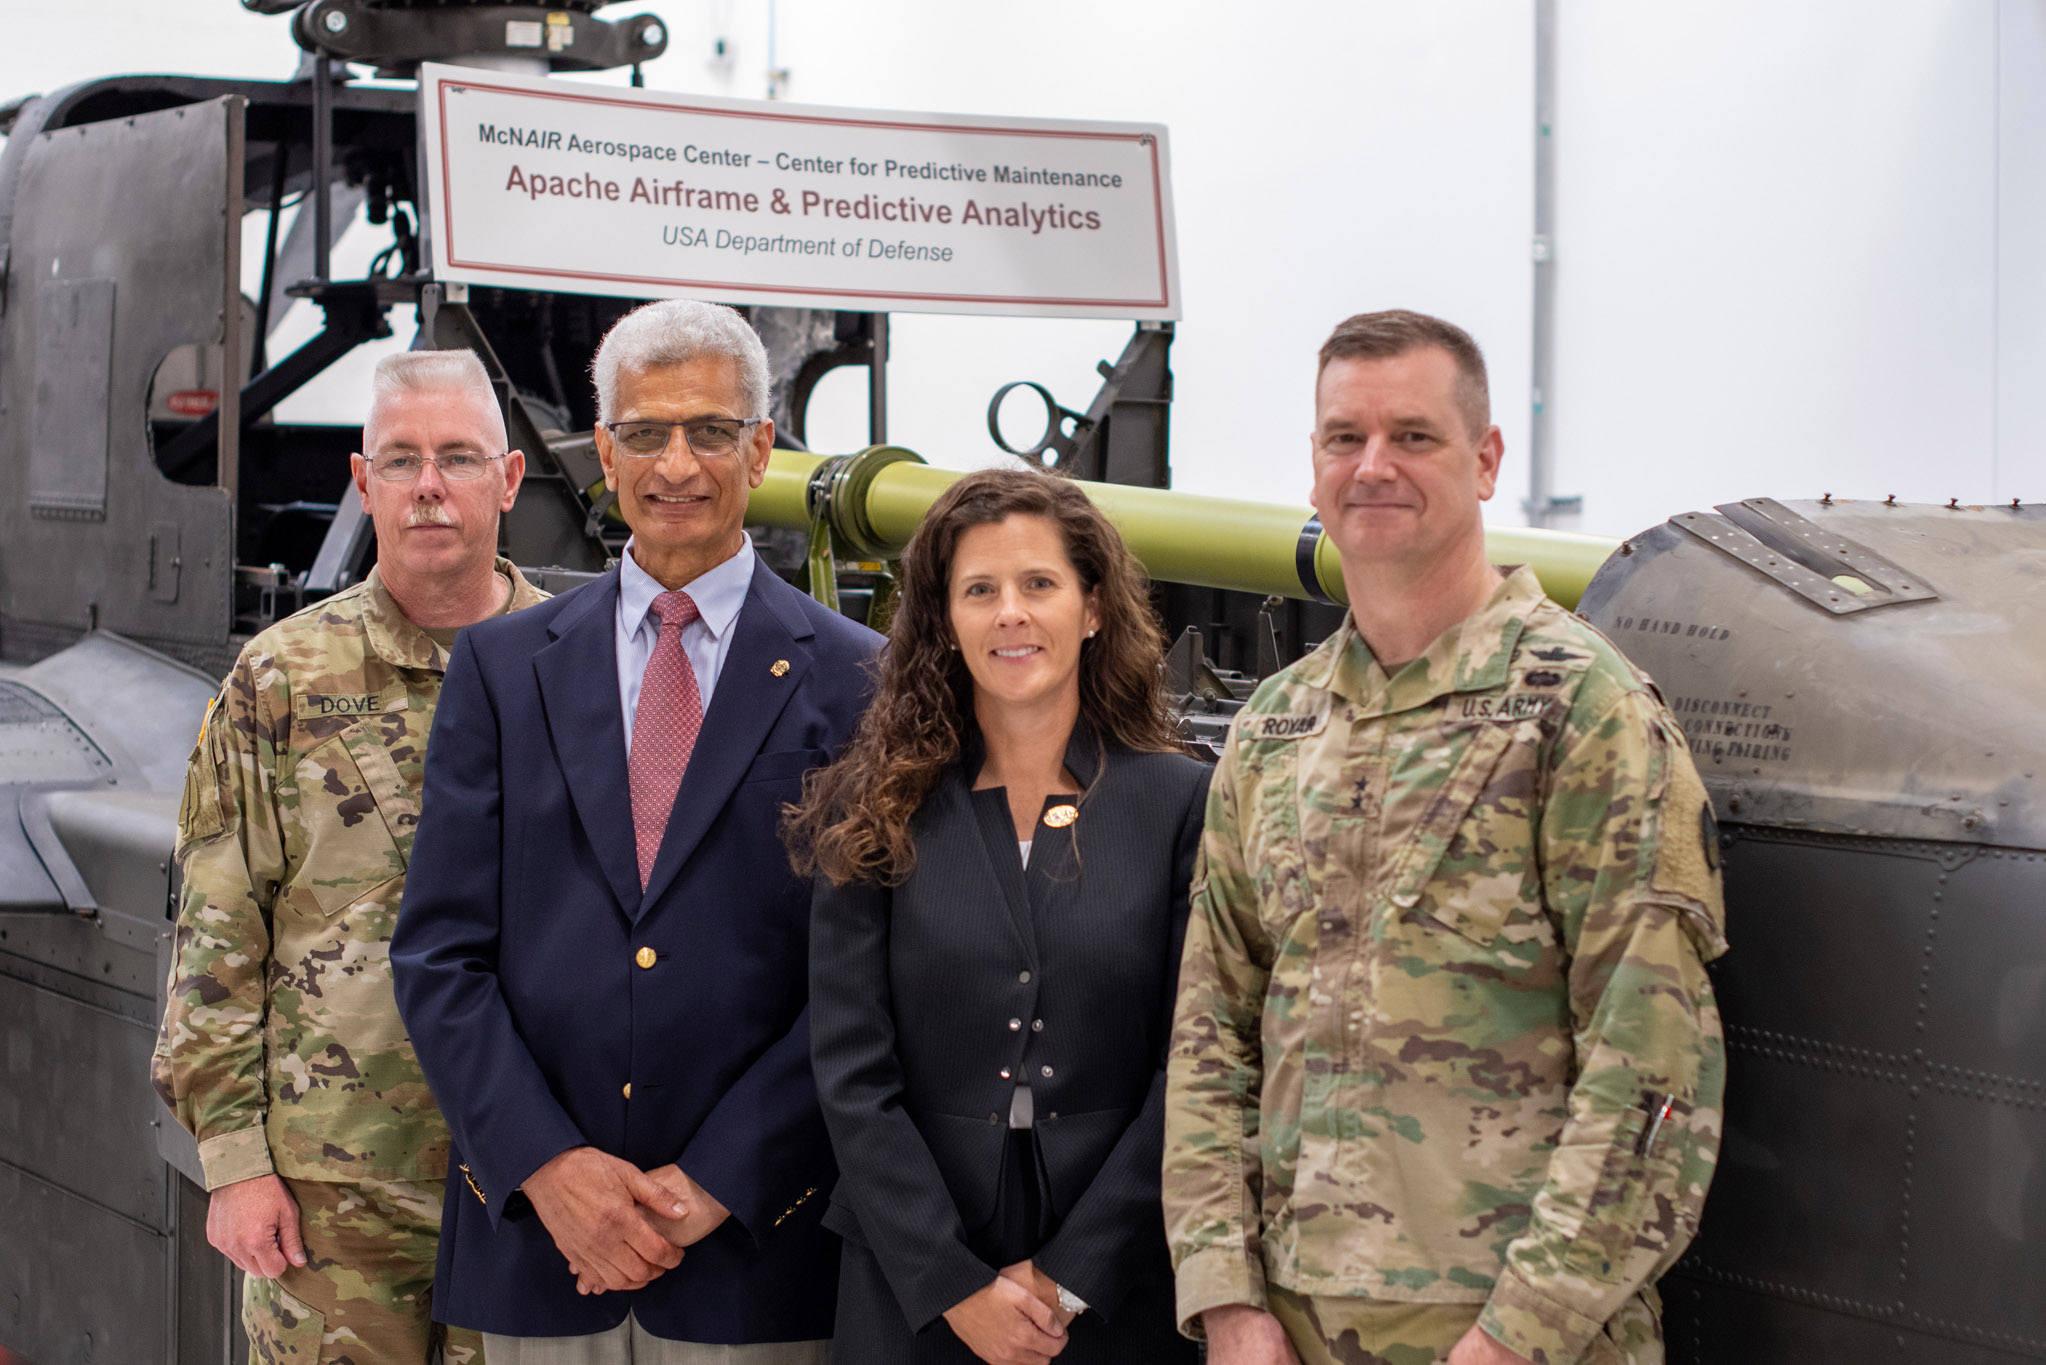 Sarj. Maj. George Dove, Dr. Bayoumi, Senior Sustainment Advisor Ms. Cindy Ponder , AMCOM Commander Maj. Gen. Todd Royar and FVL CFT stand together.